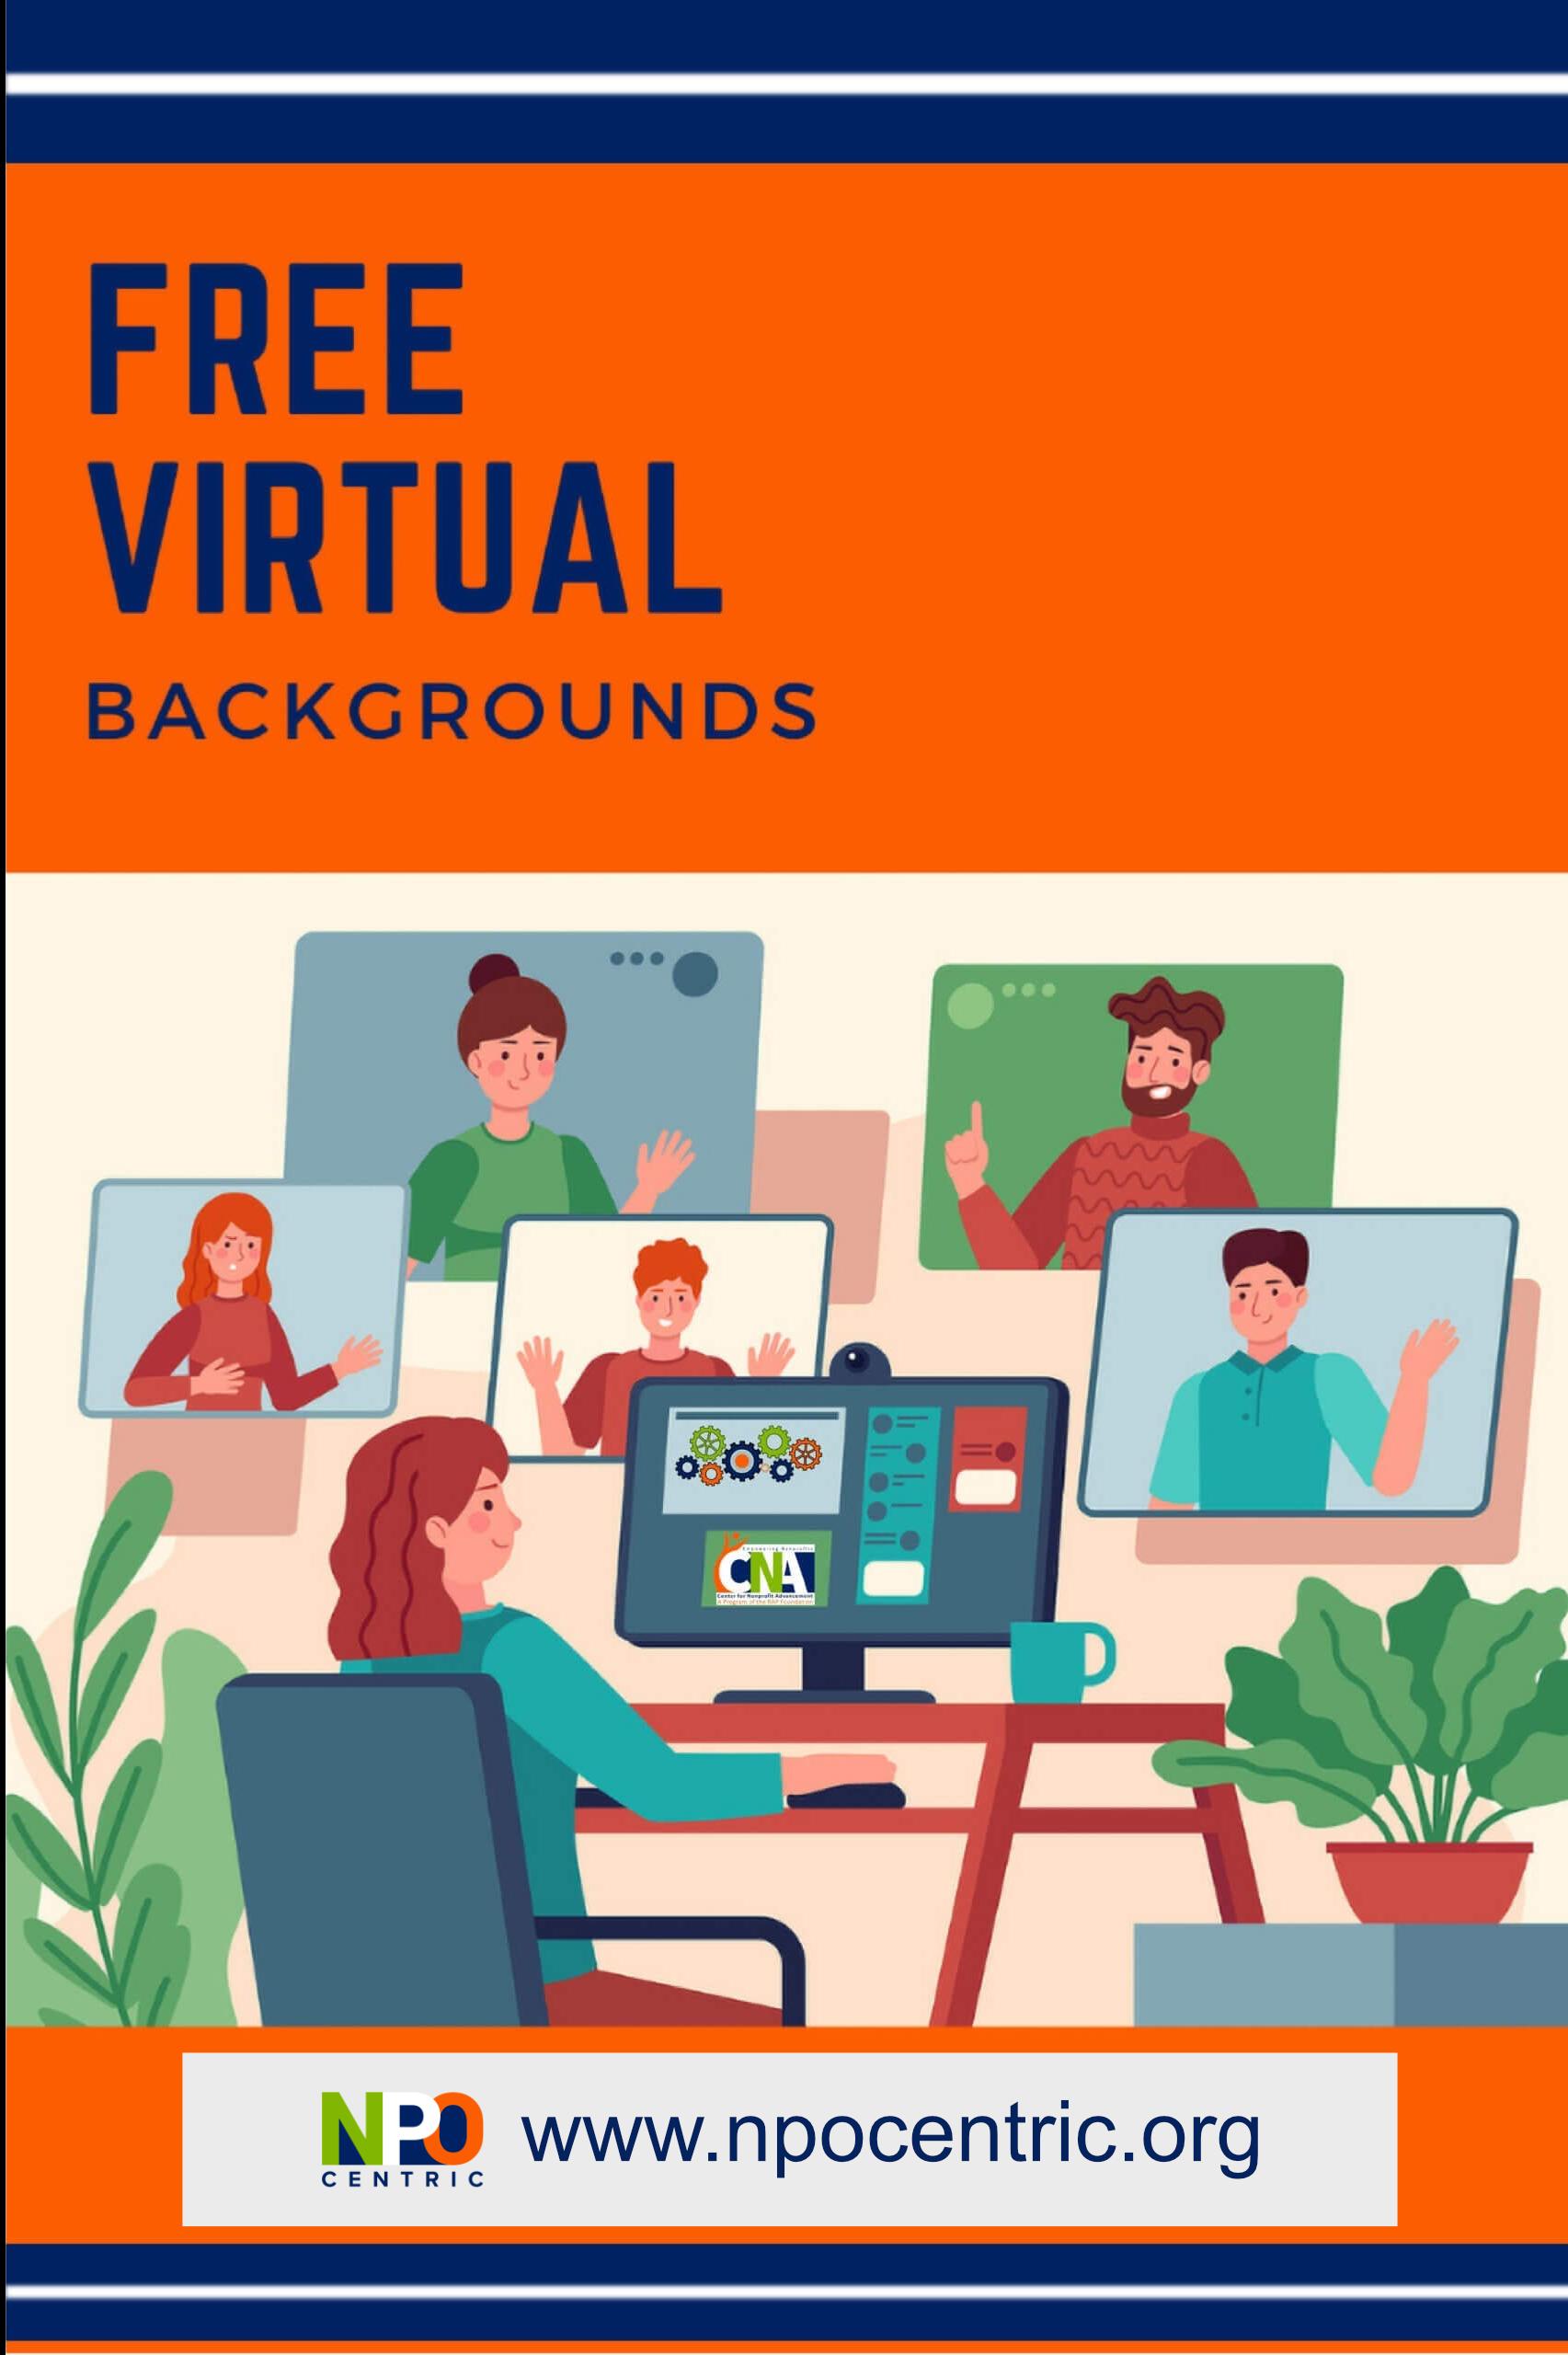 free virtual backgrounds for webinars